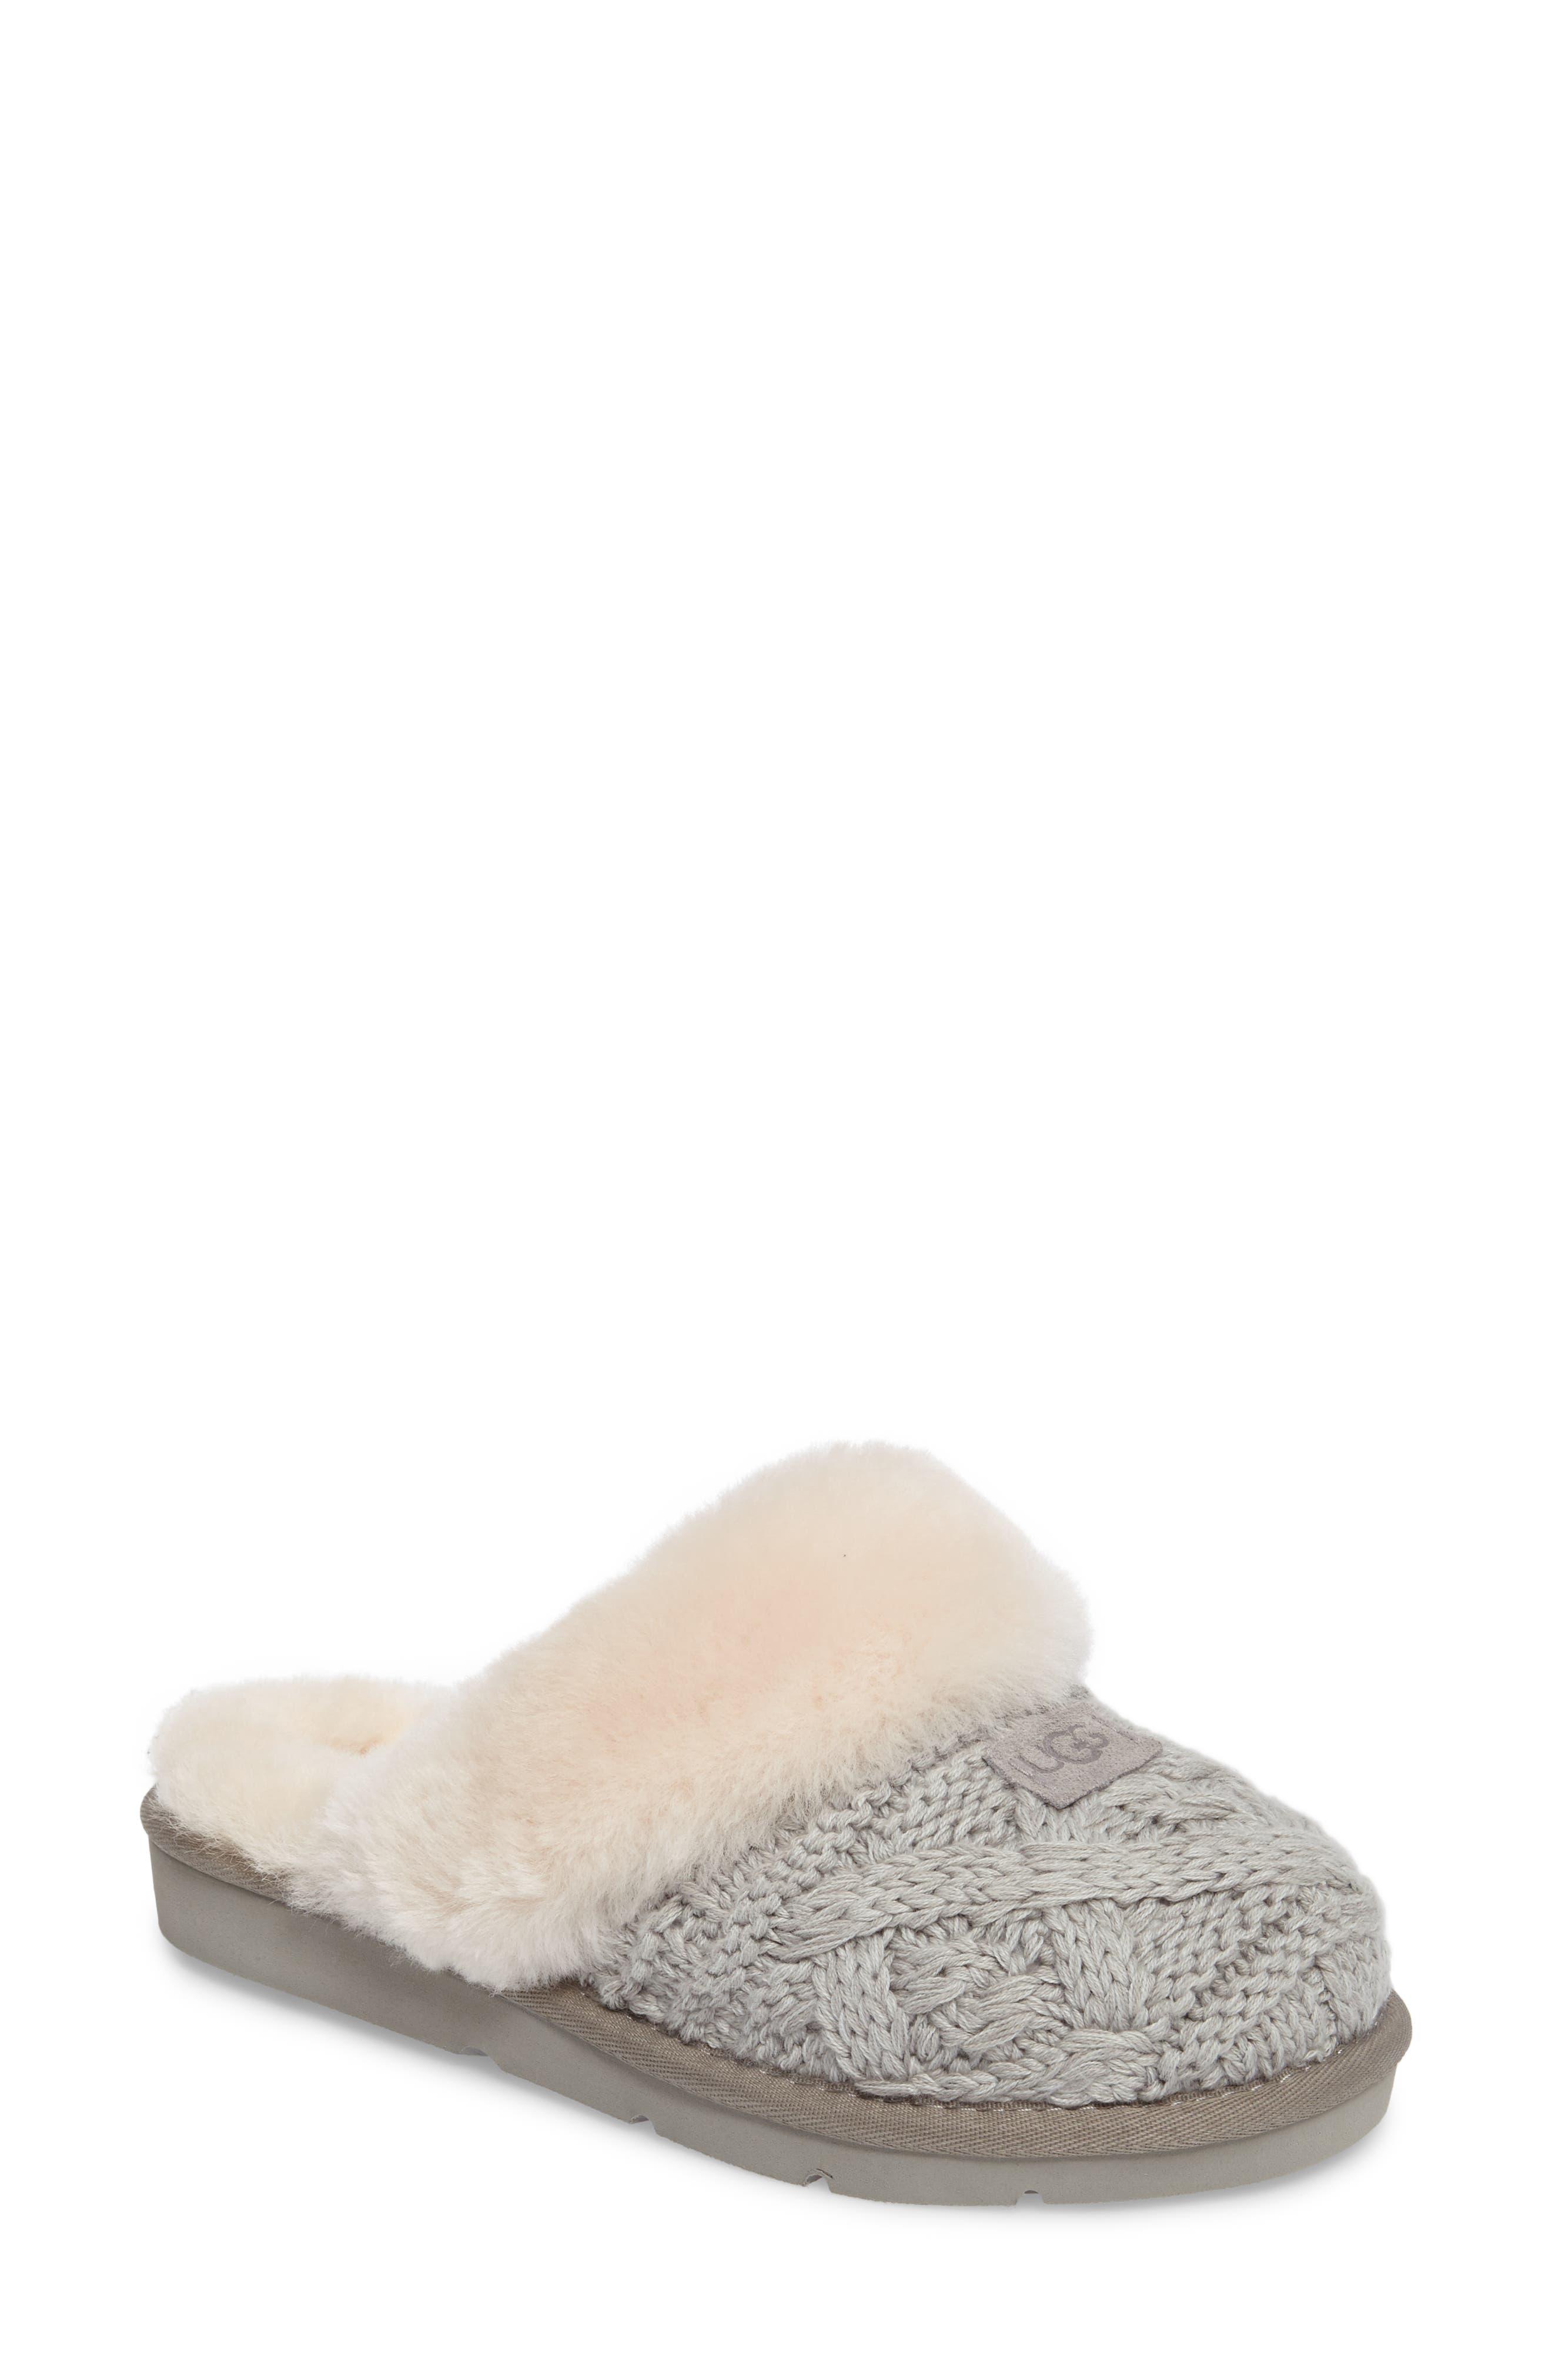 Cozy Cable Slipper,                         Main,                         color, Seal Fabric